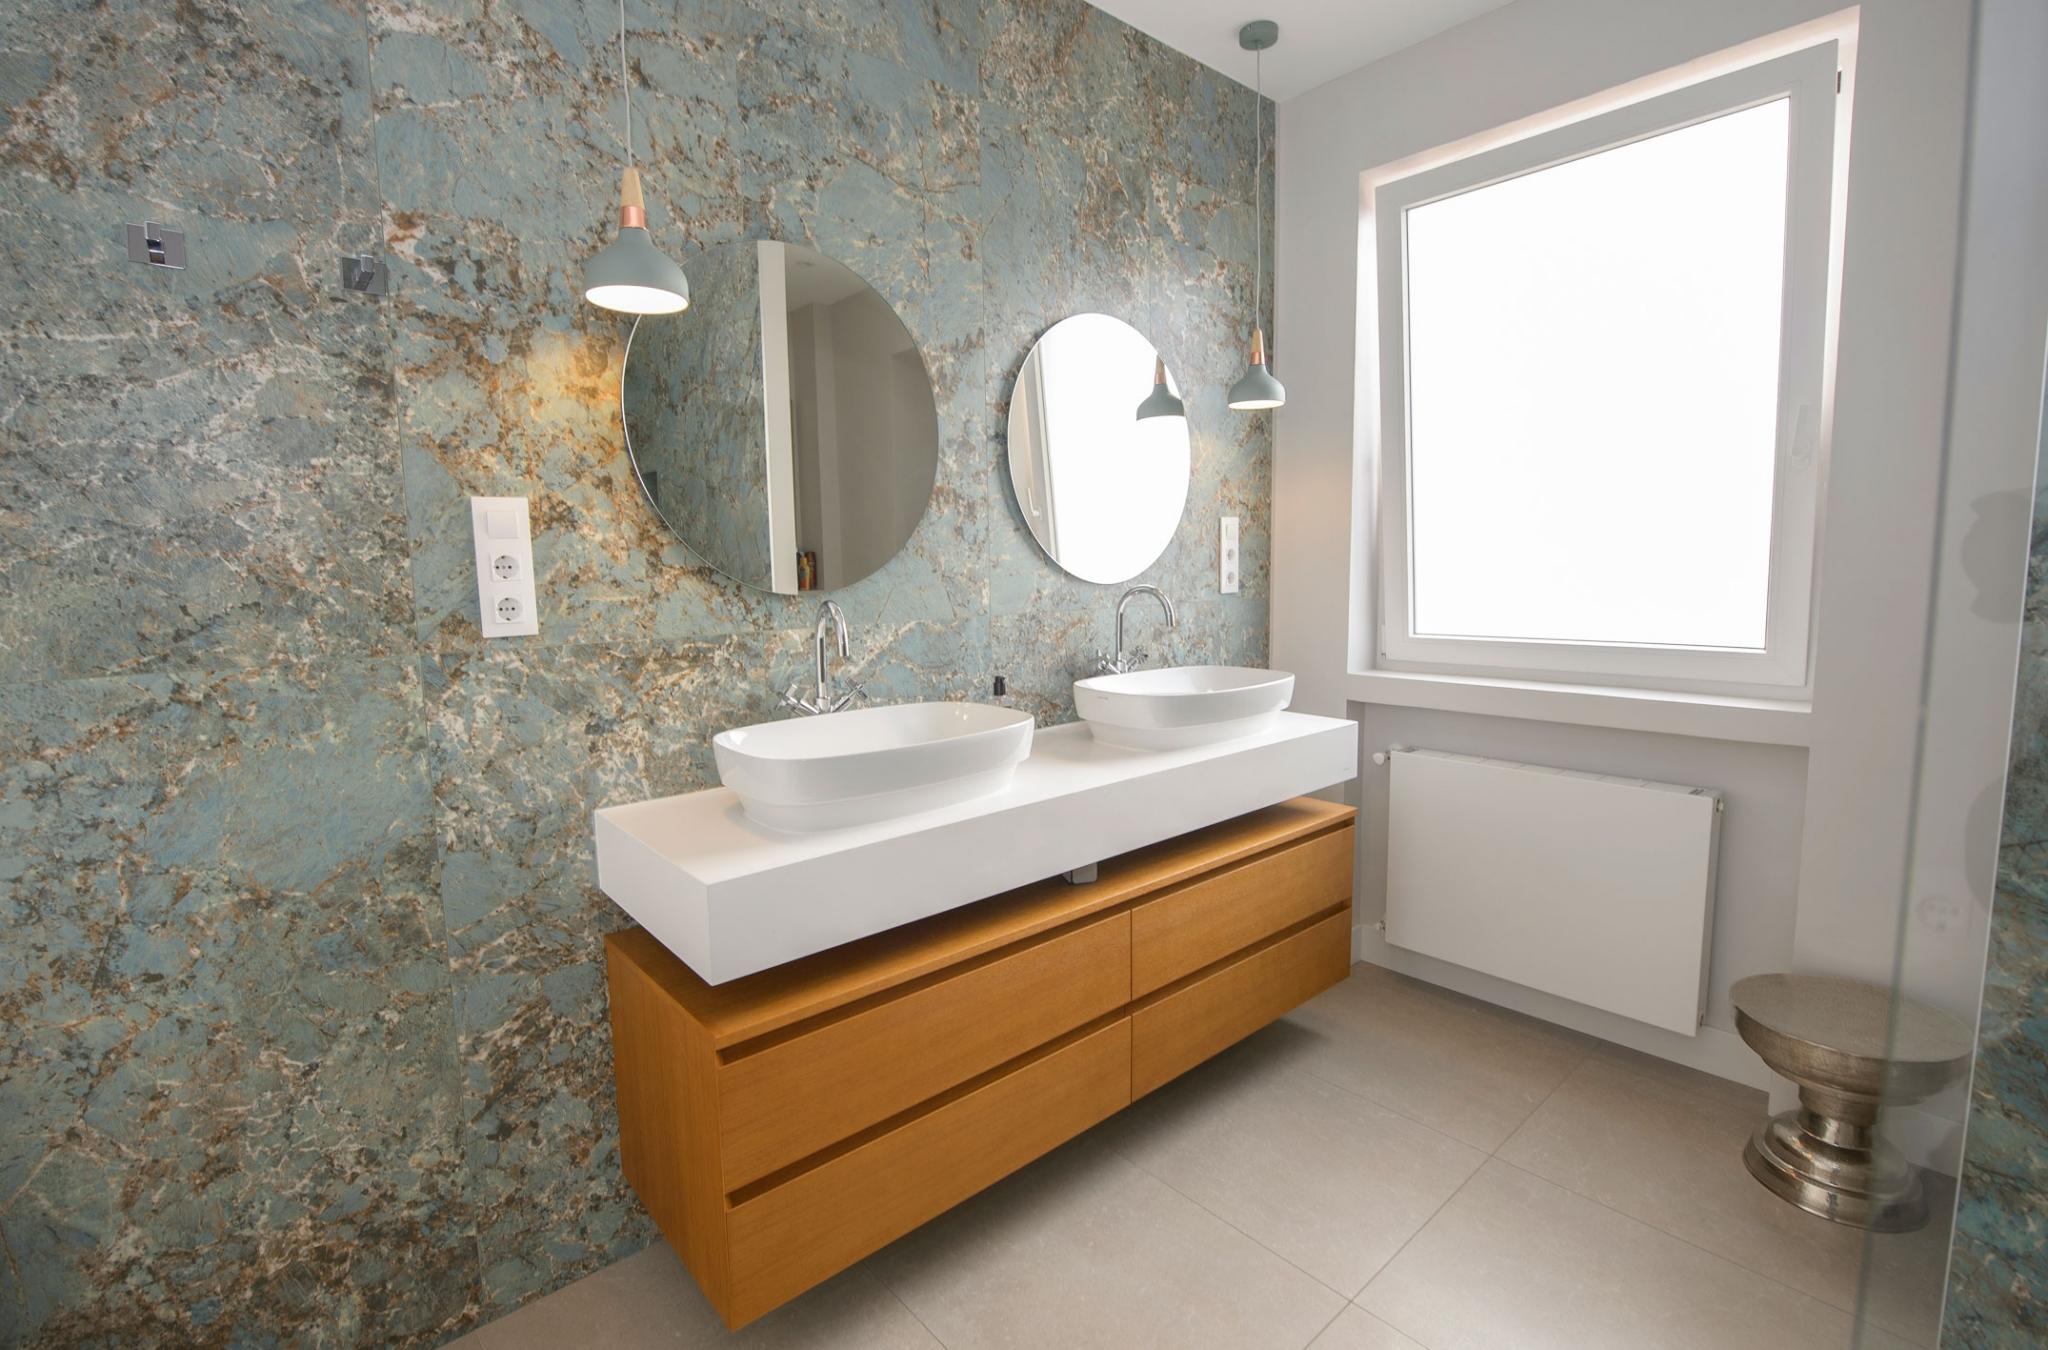 Baño en calle Velázquez con paredes en porcelánico degran formato imitación mármol